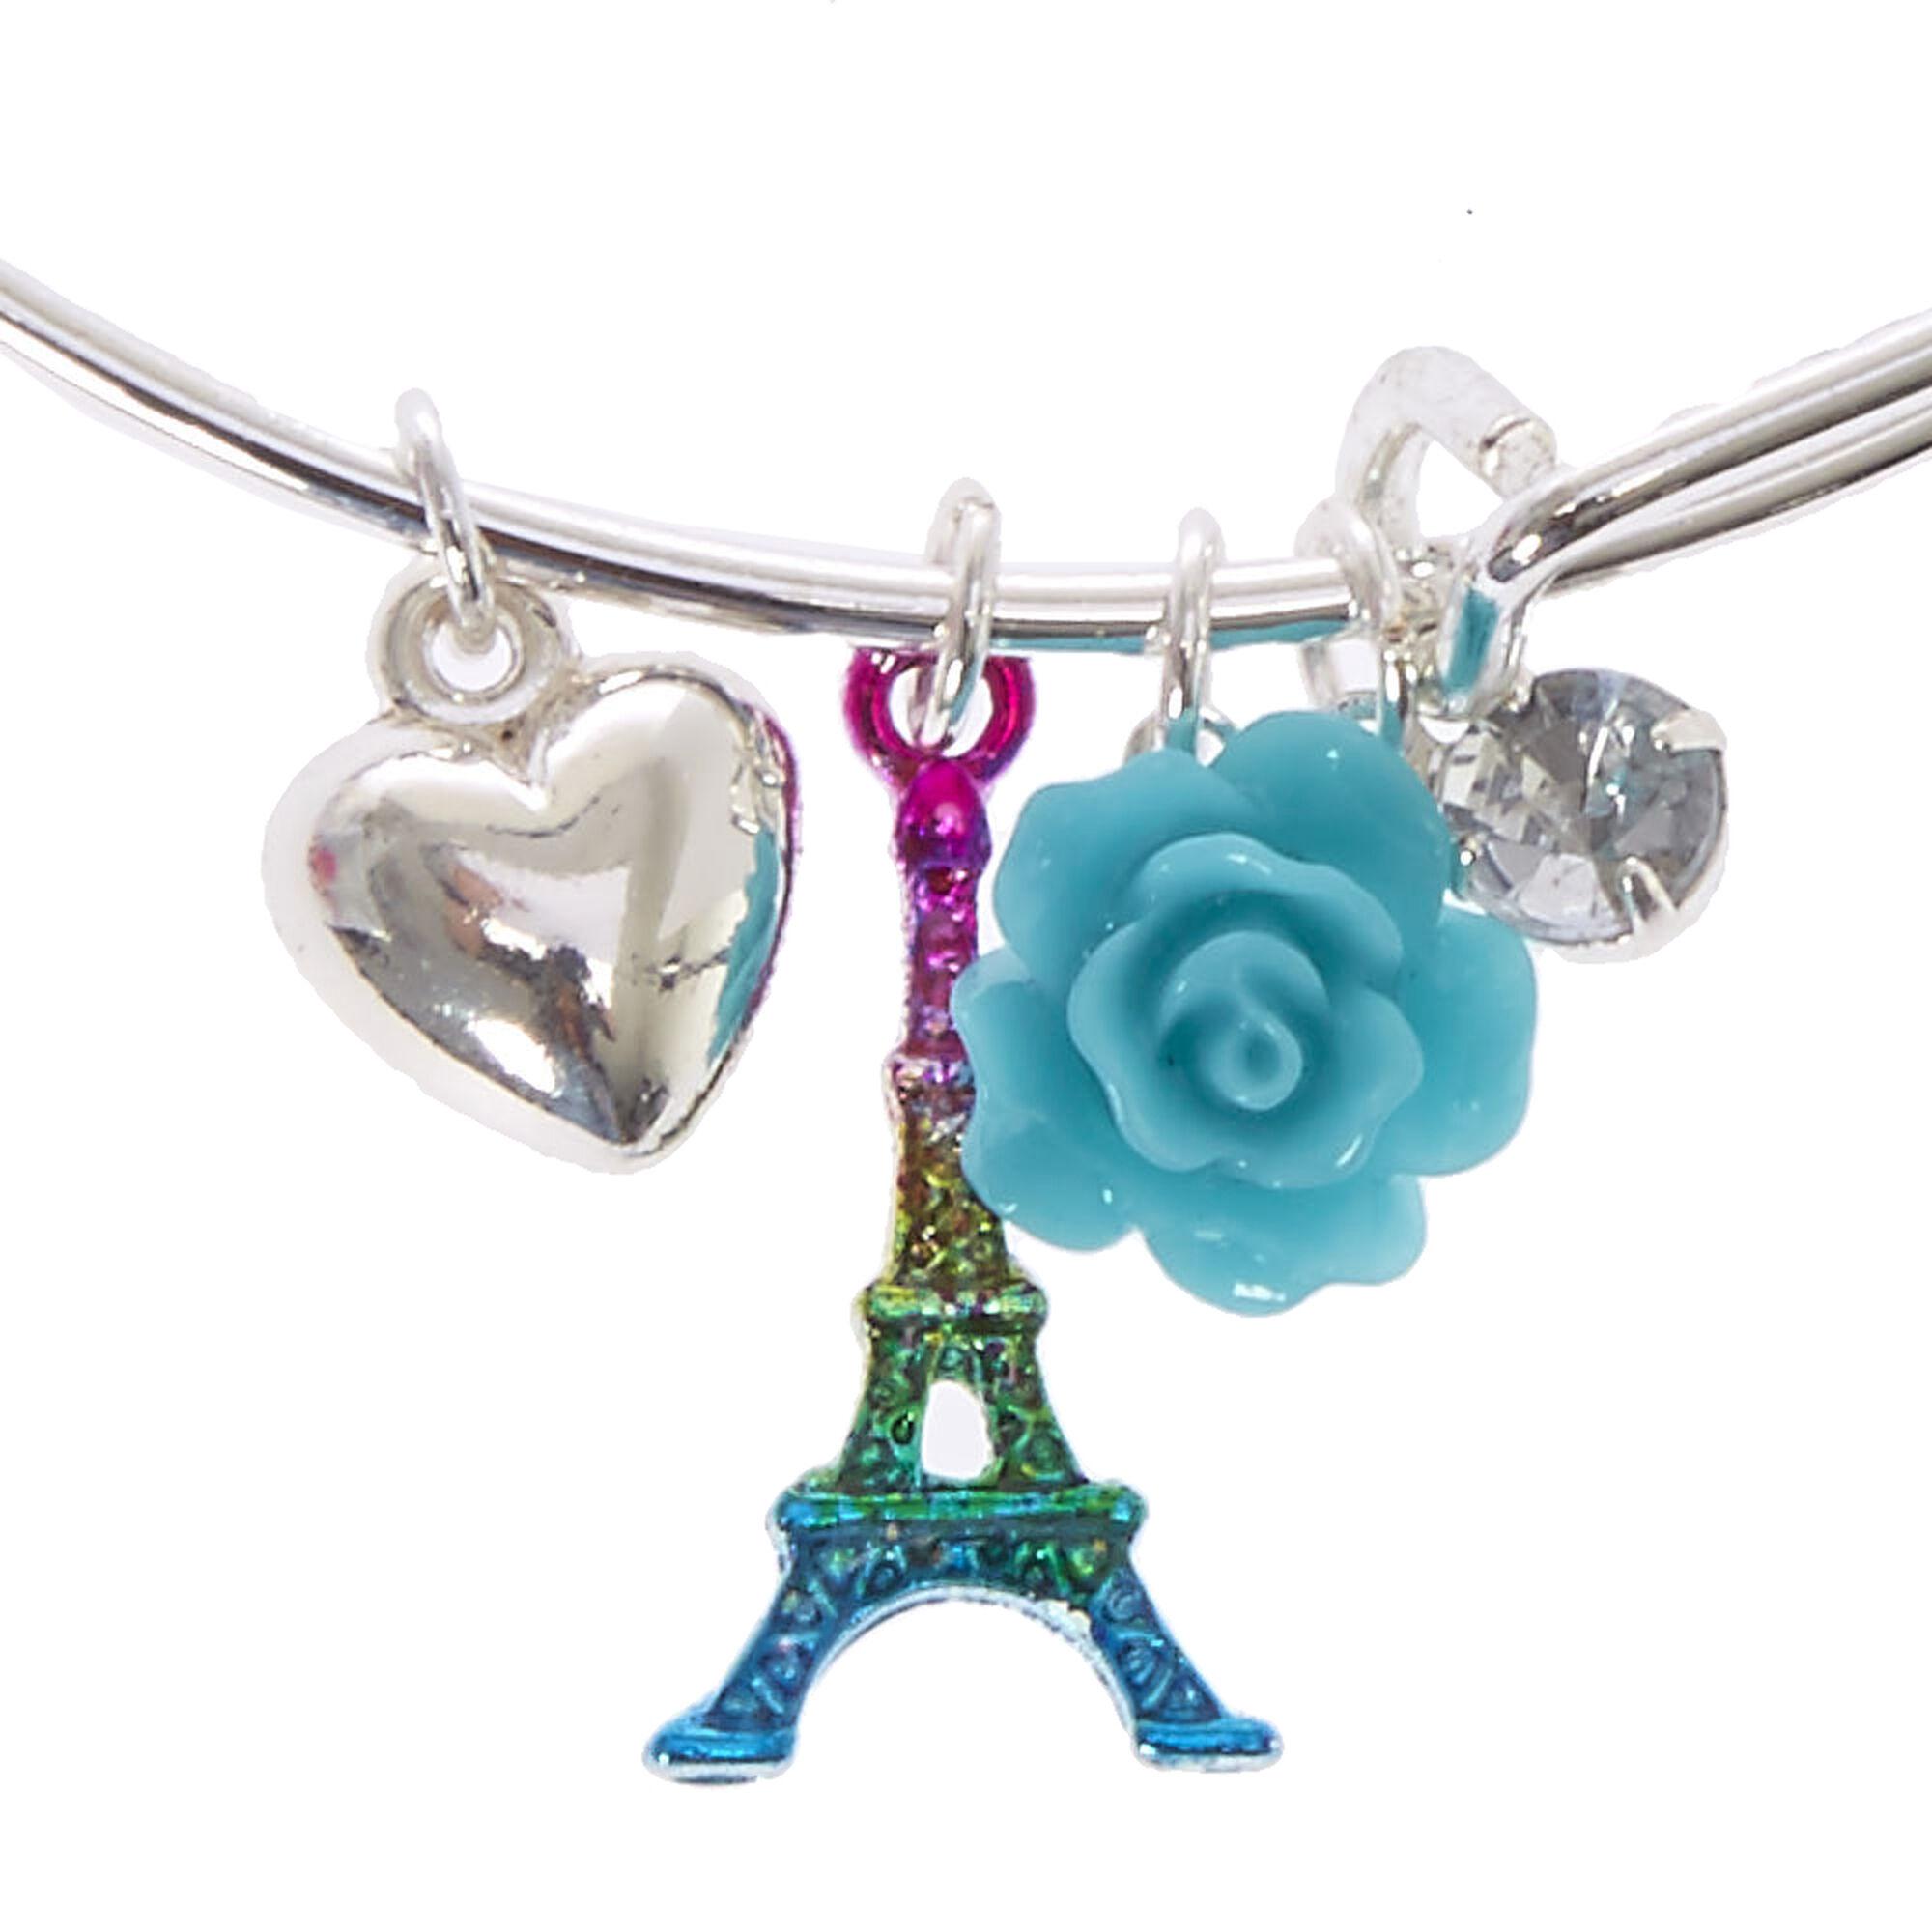 Metallic Rainbow Eiffel Tower Charm Bangle Bracelet